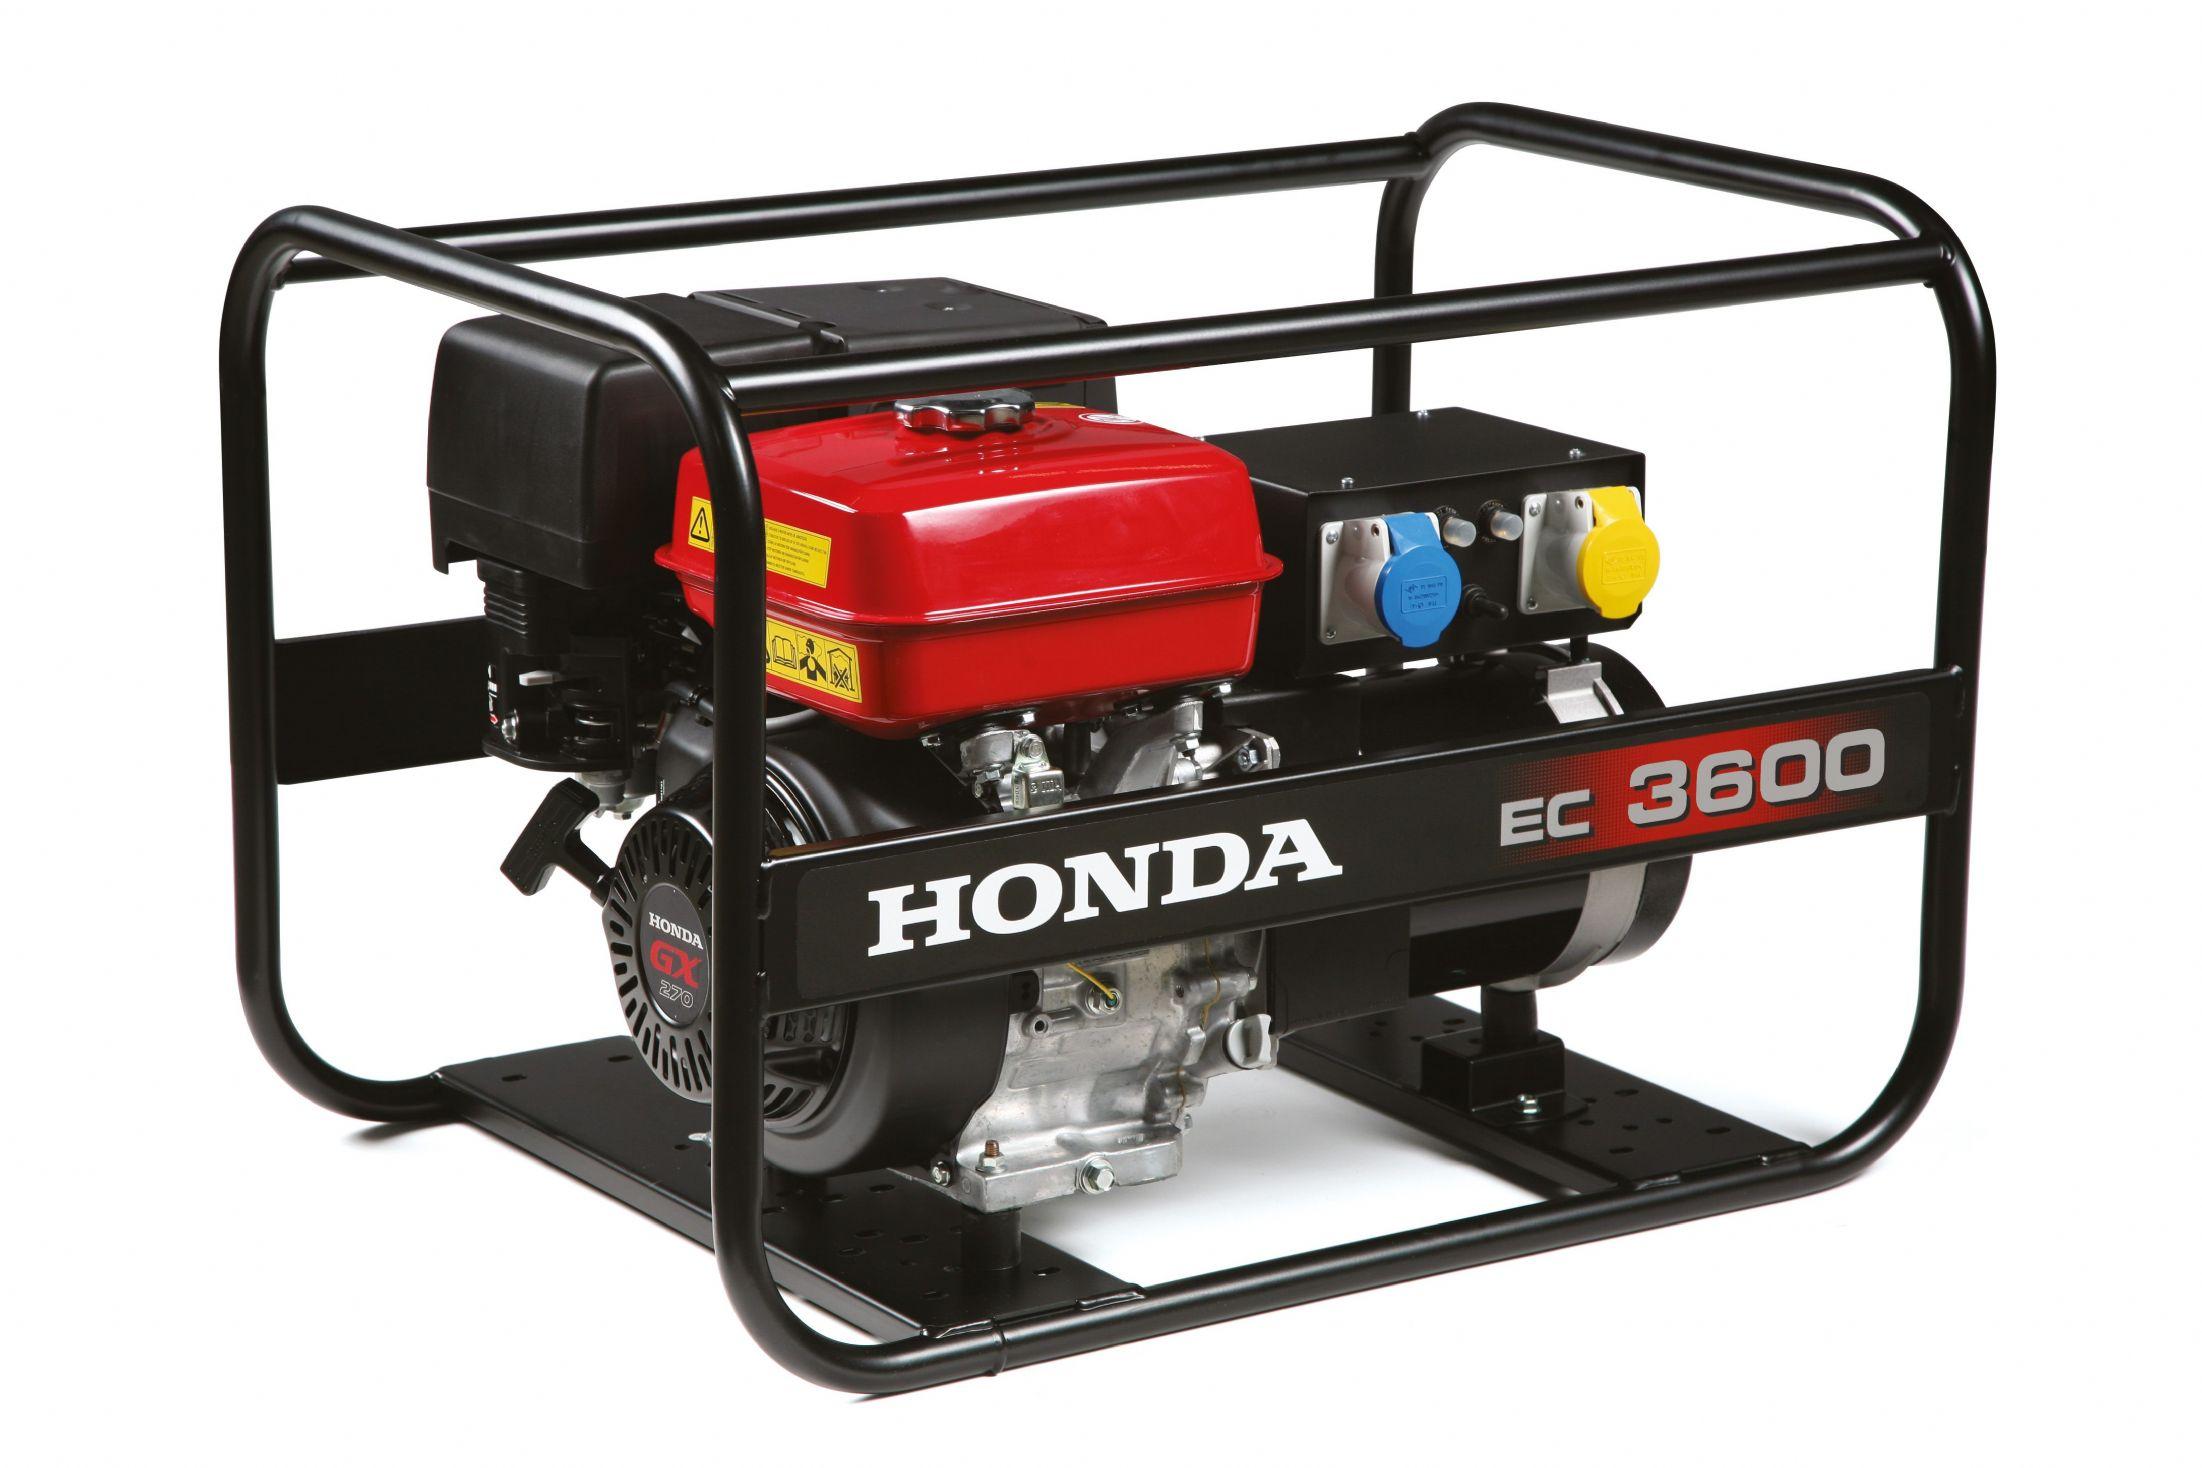 Honda EC 3600 duurzaam aggregaat/generator